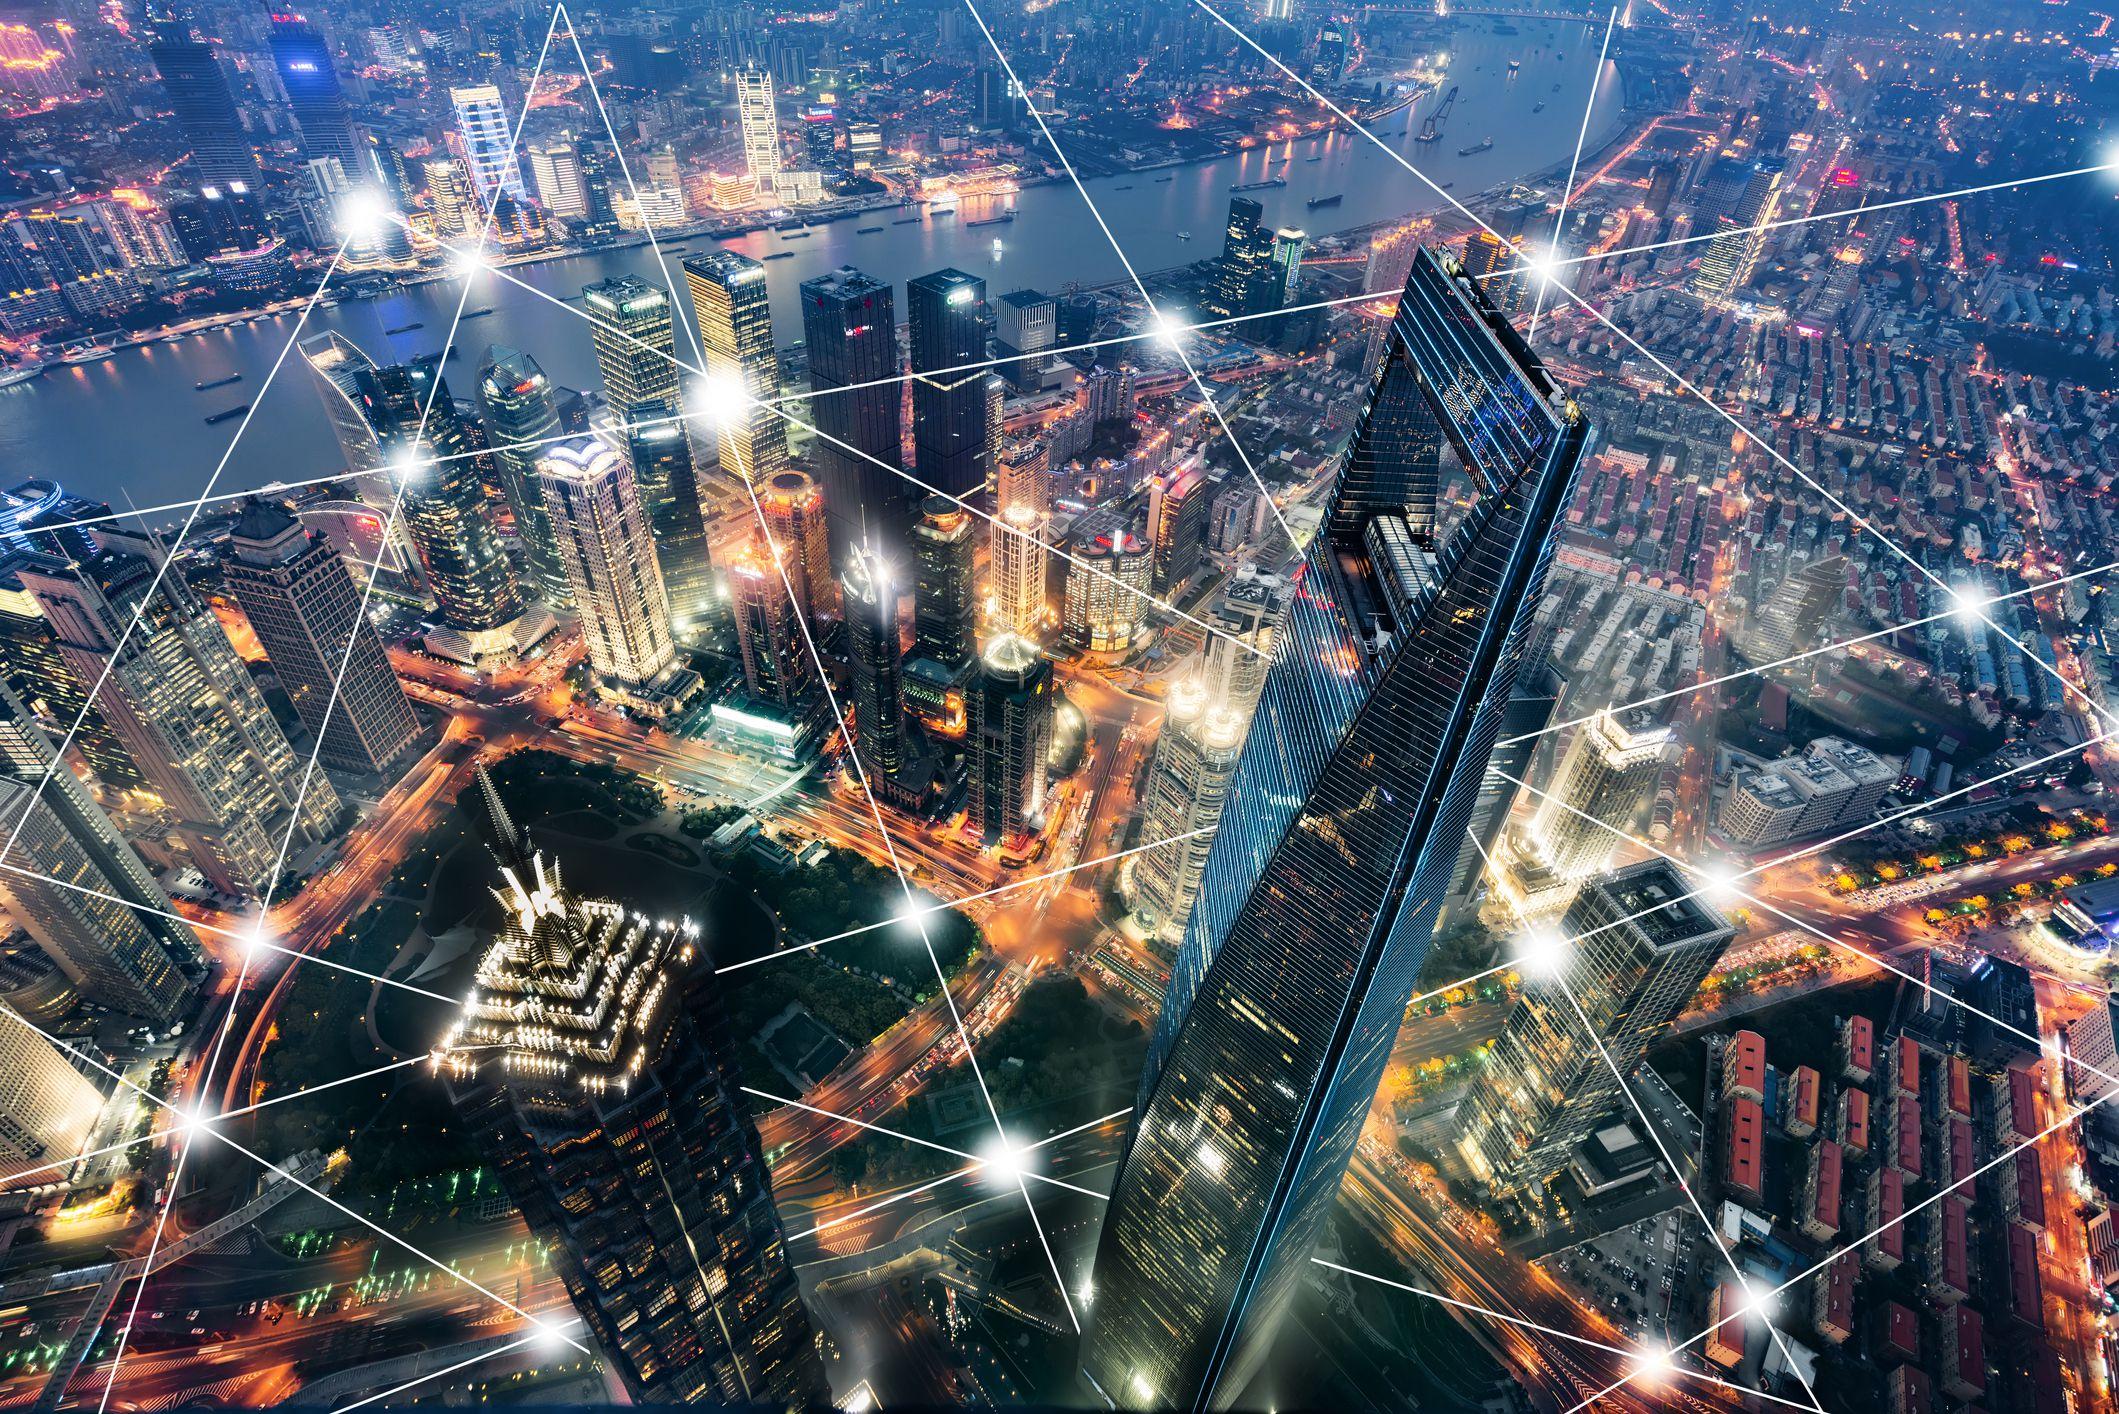 A city's wireless network